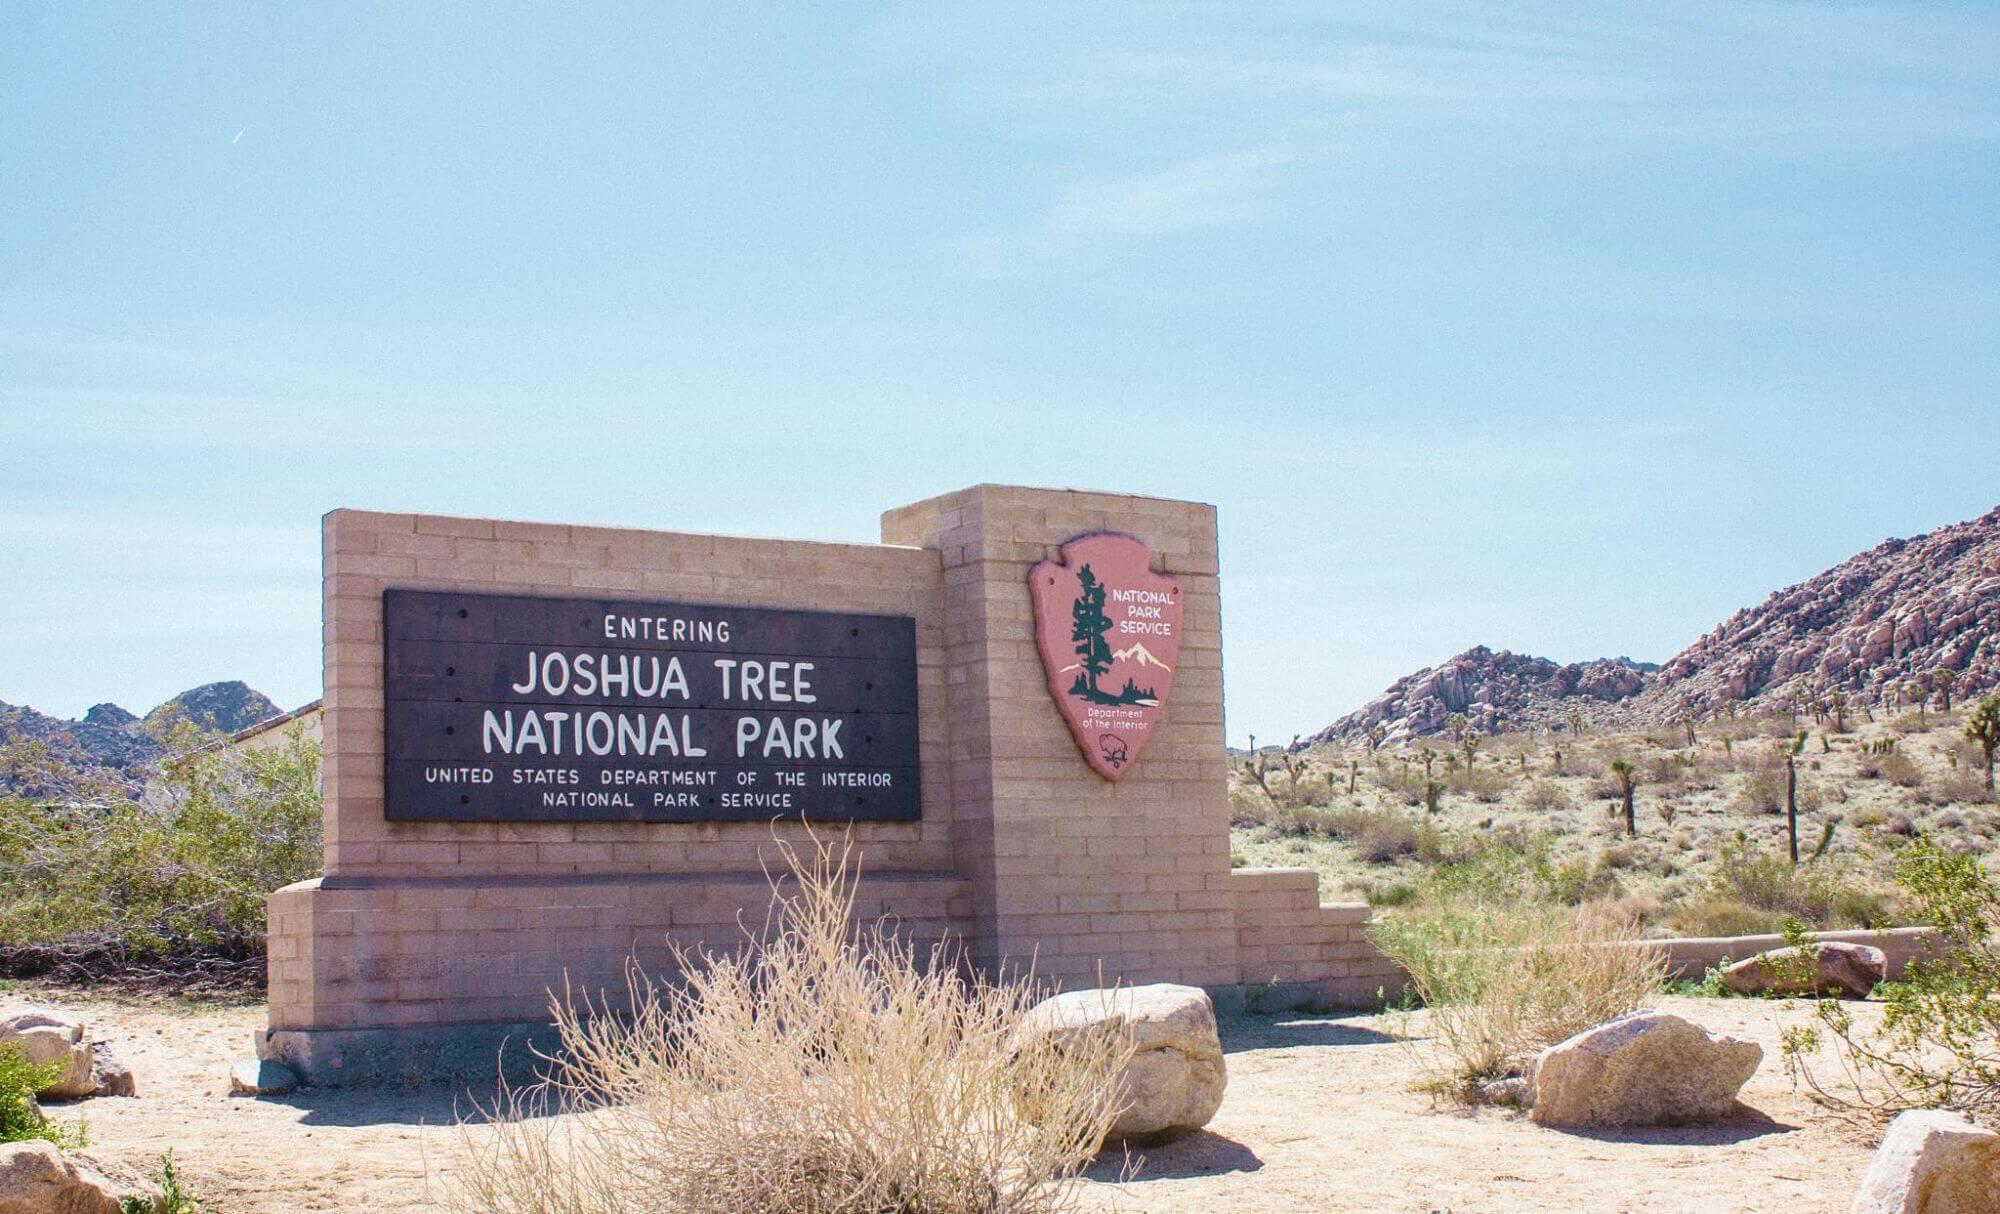 Entrance to Joshua Tree National Park